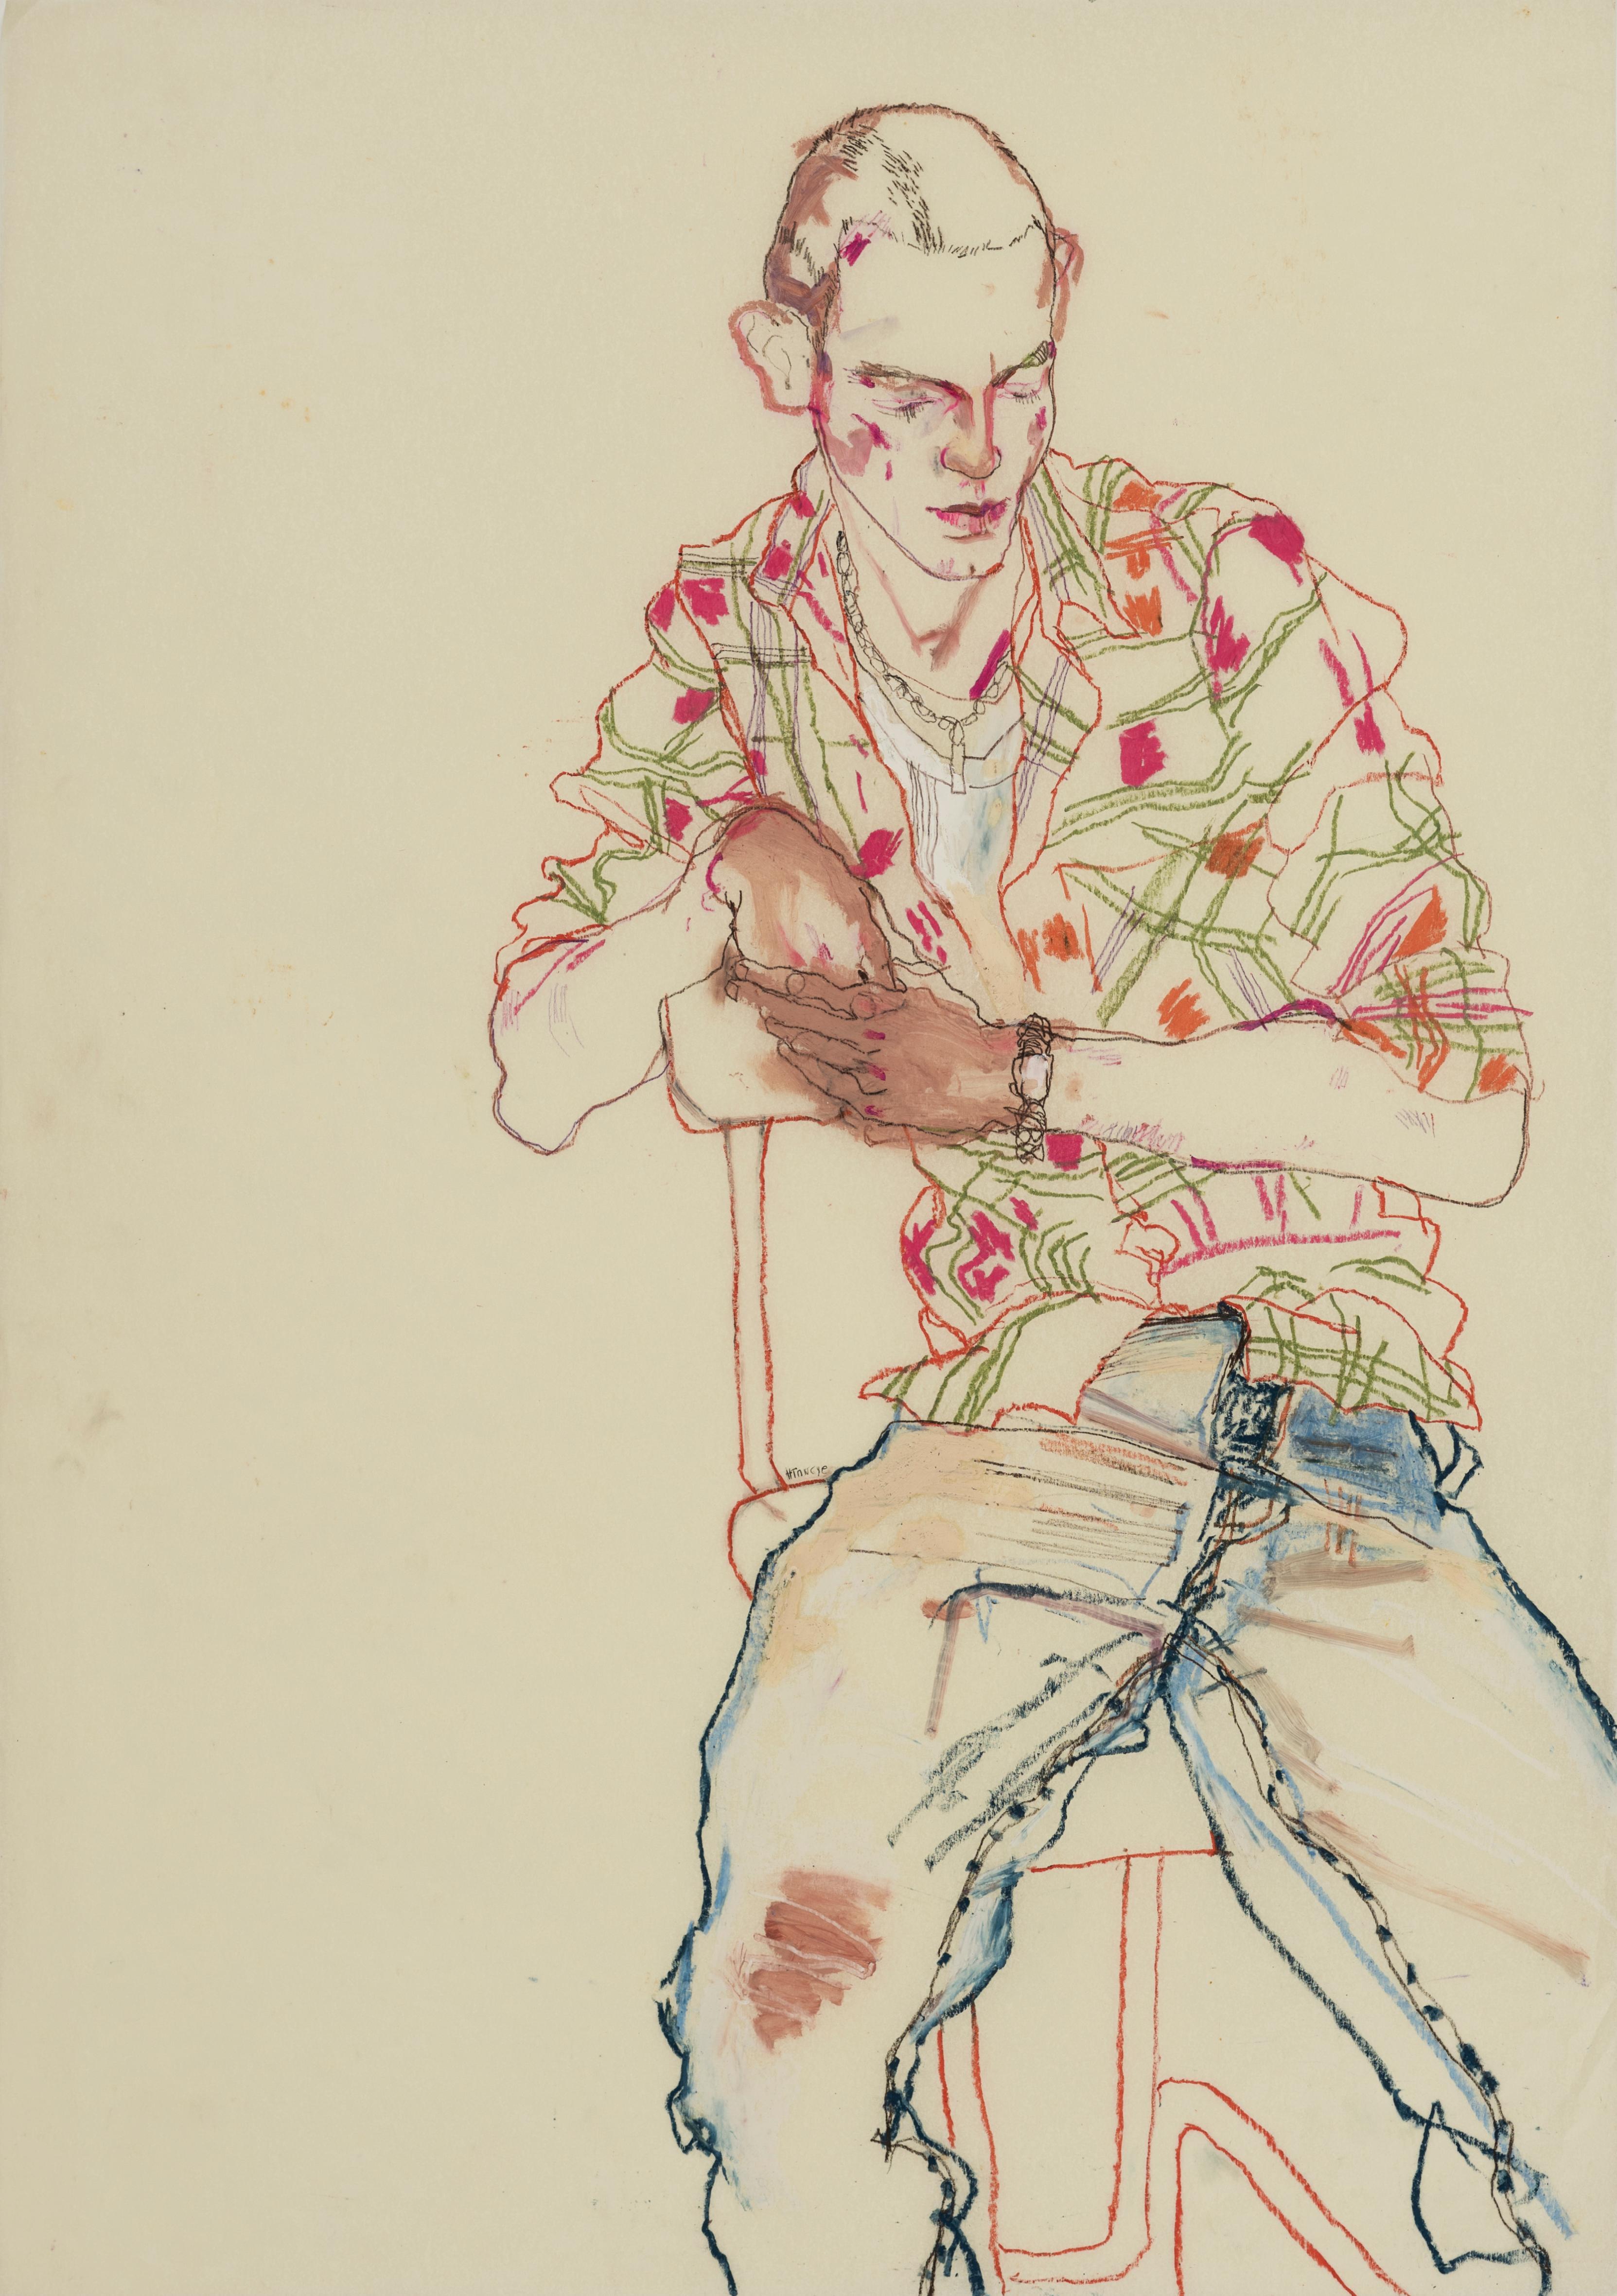 Michele P. (Check Shirt, Blue Jeans), Mixed media on Pergamenata parchment